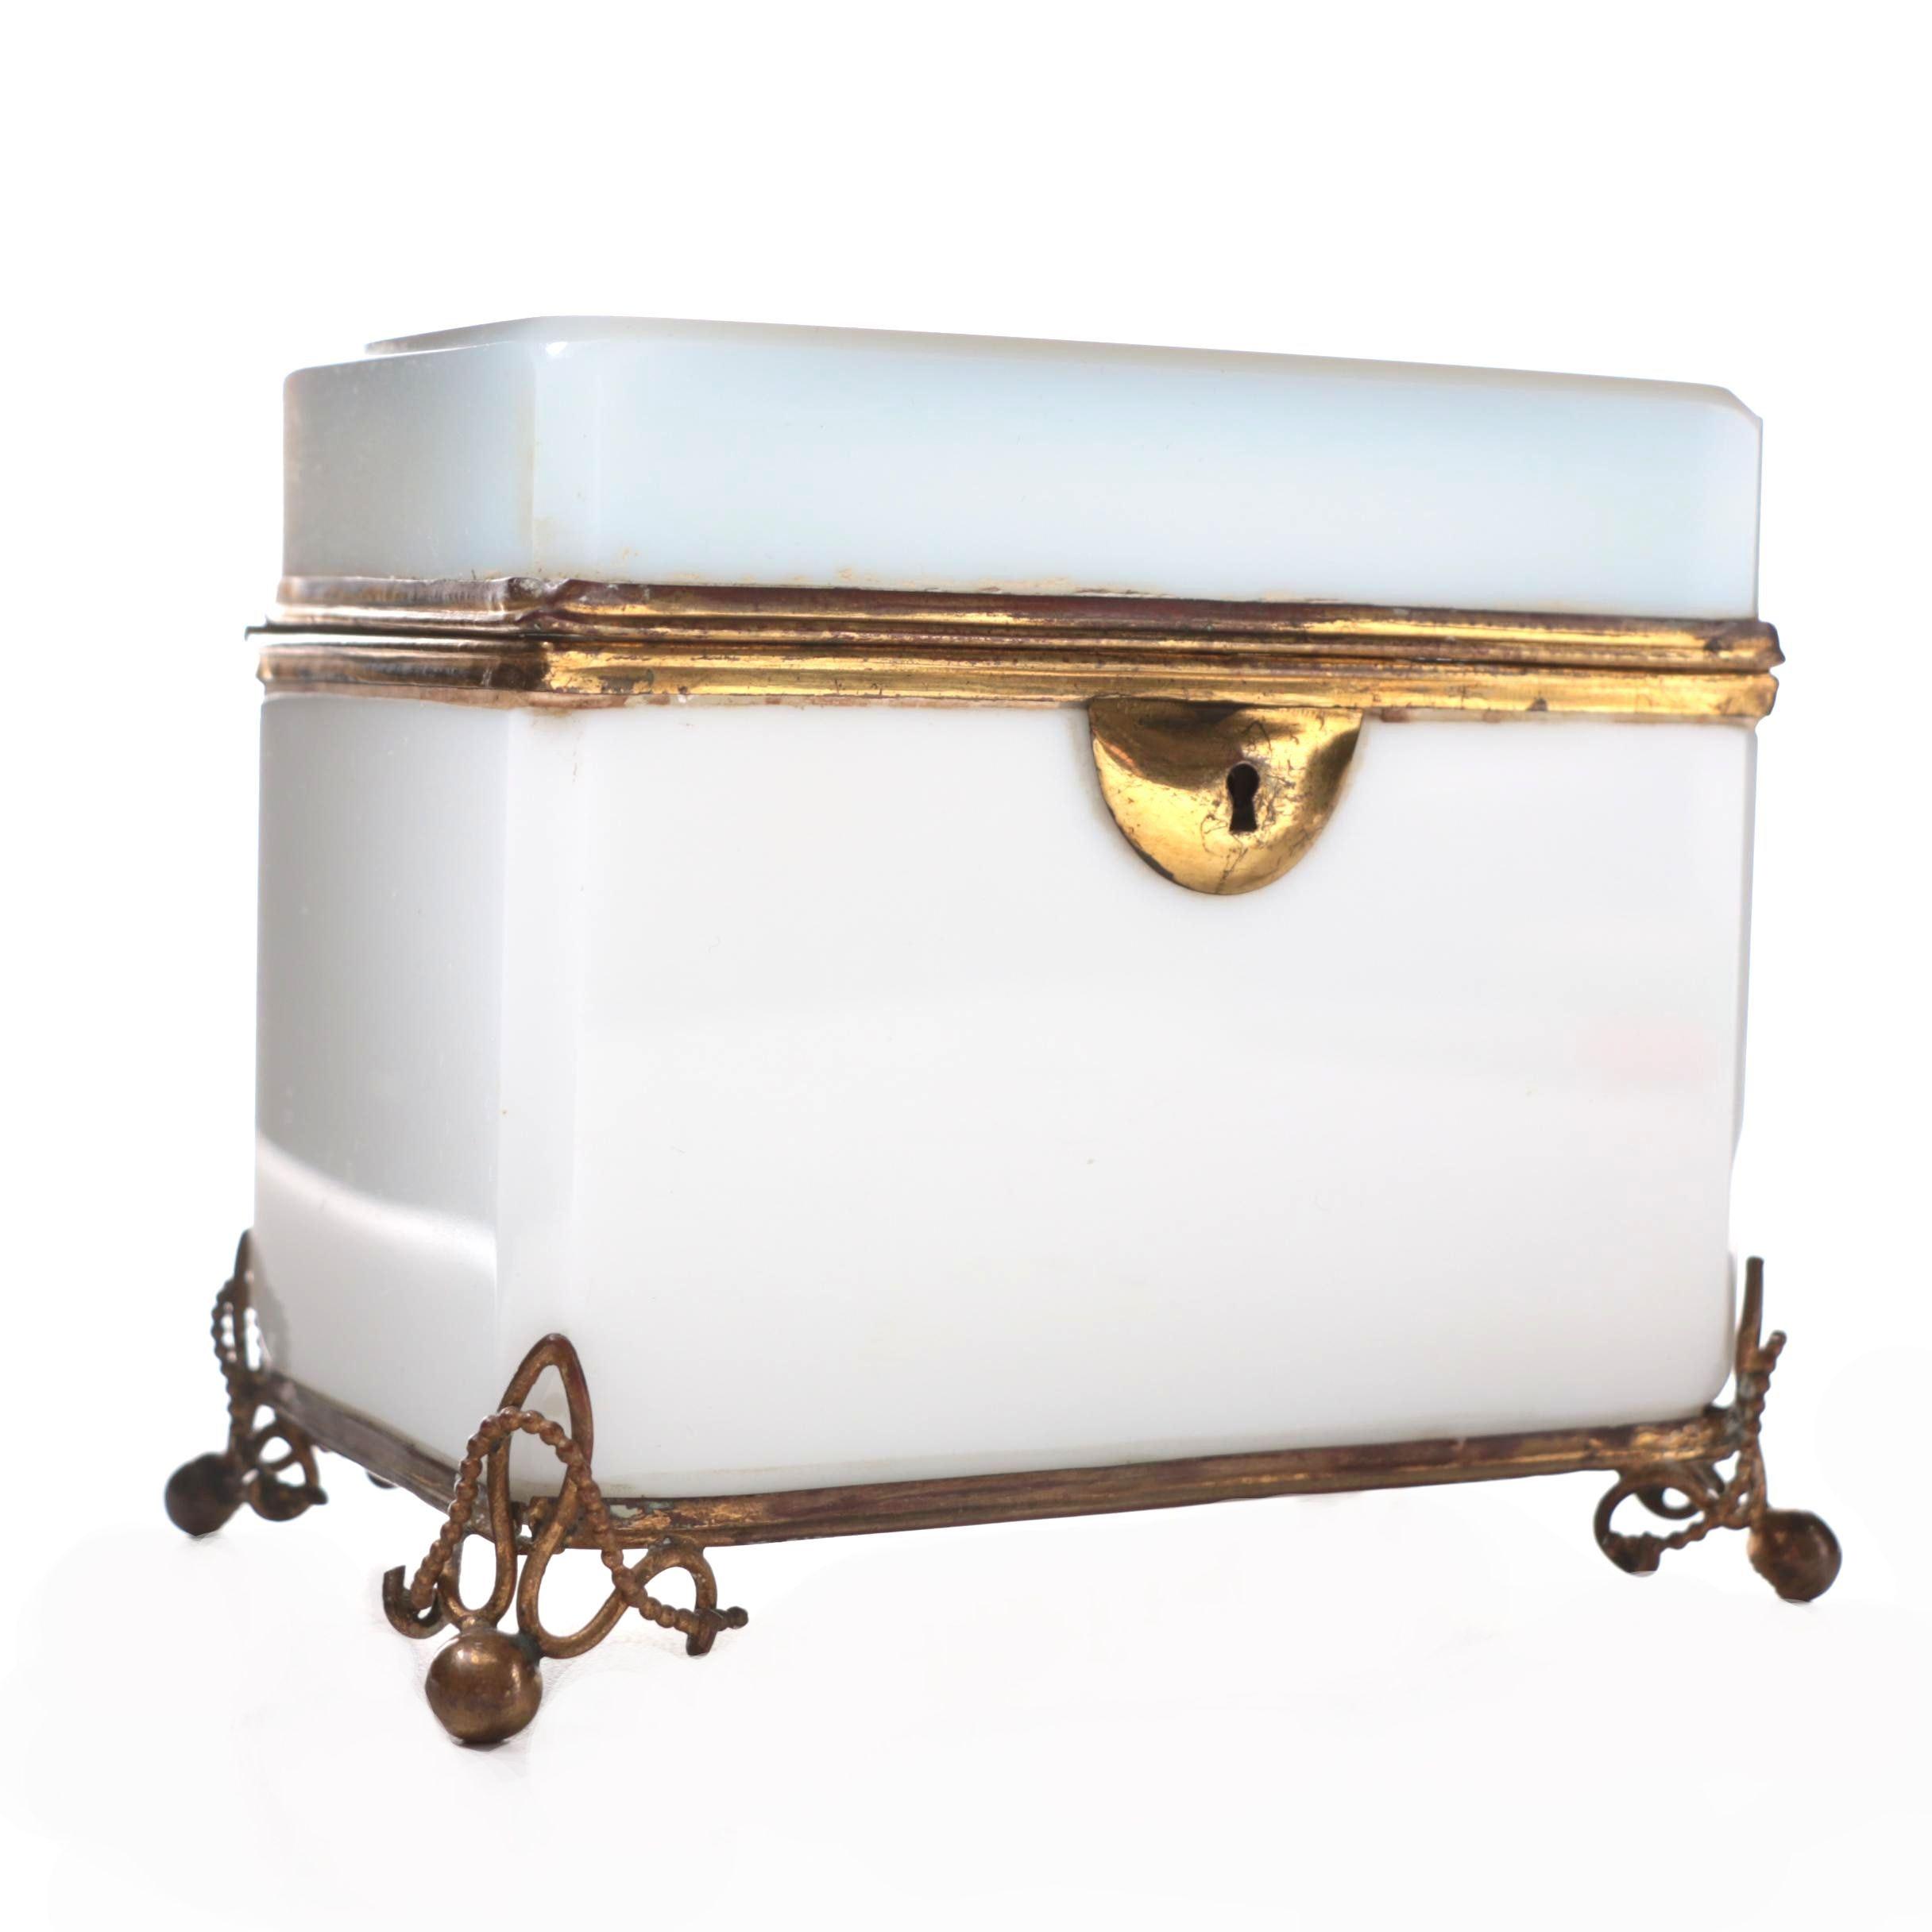 French Opaline Glass Casket Box, Late 19th Century